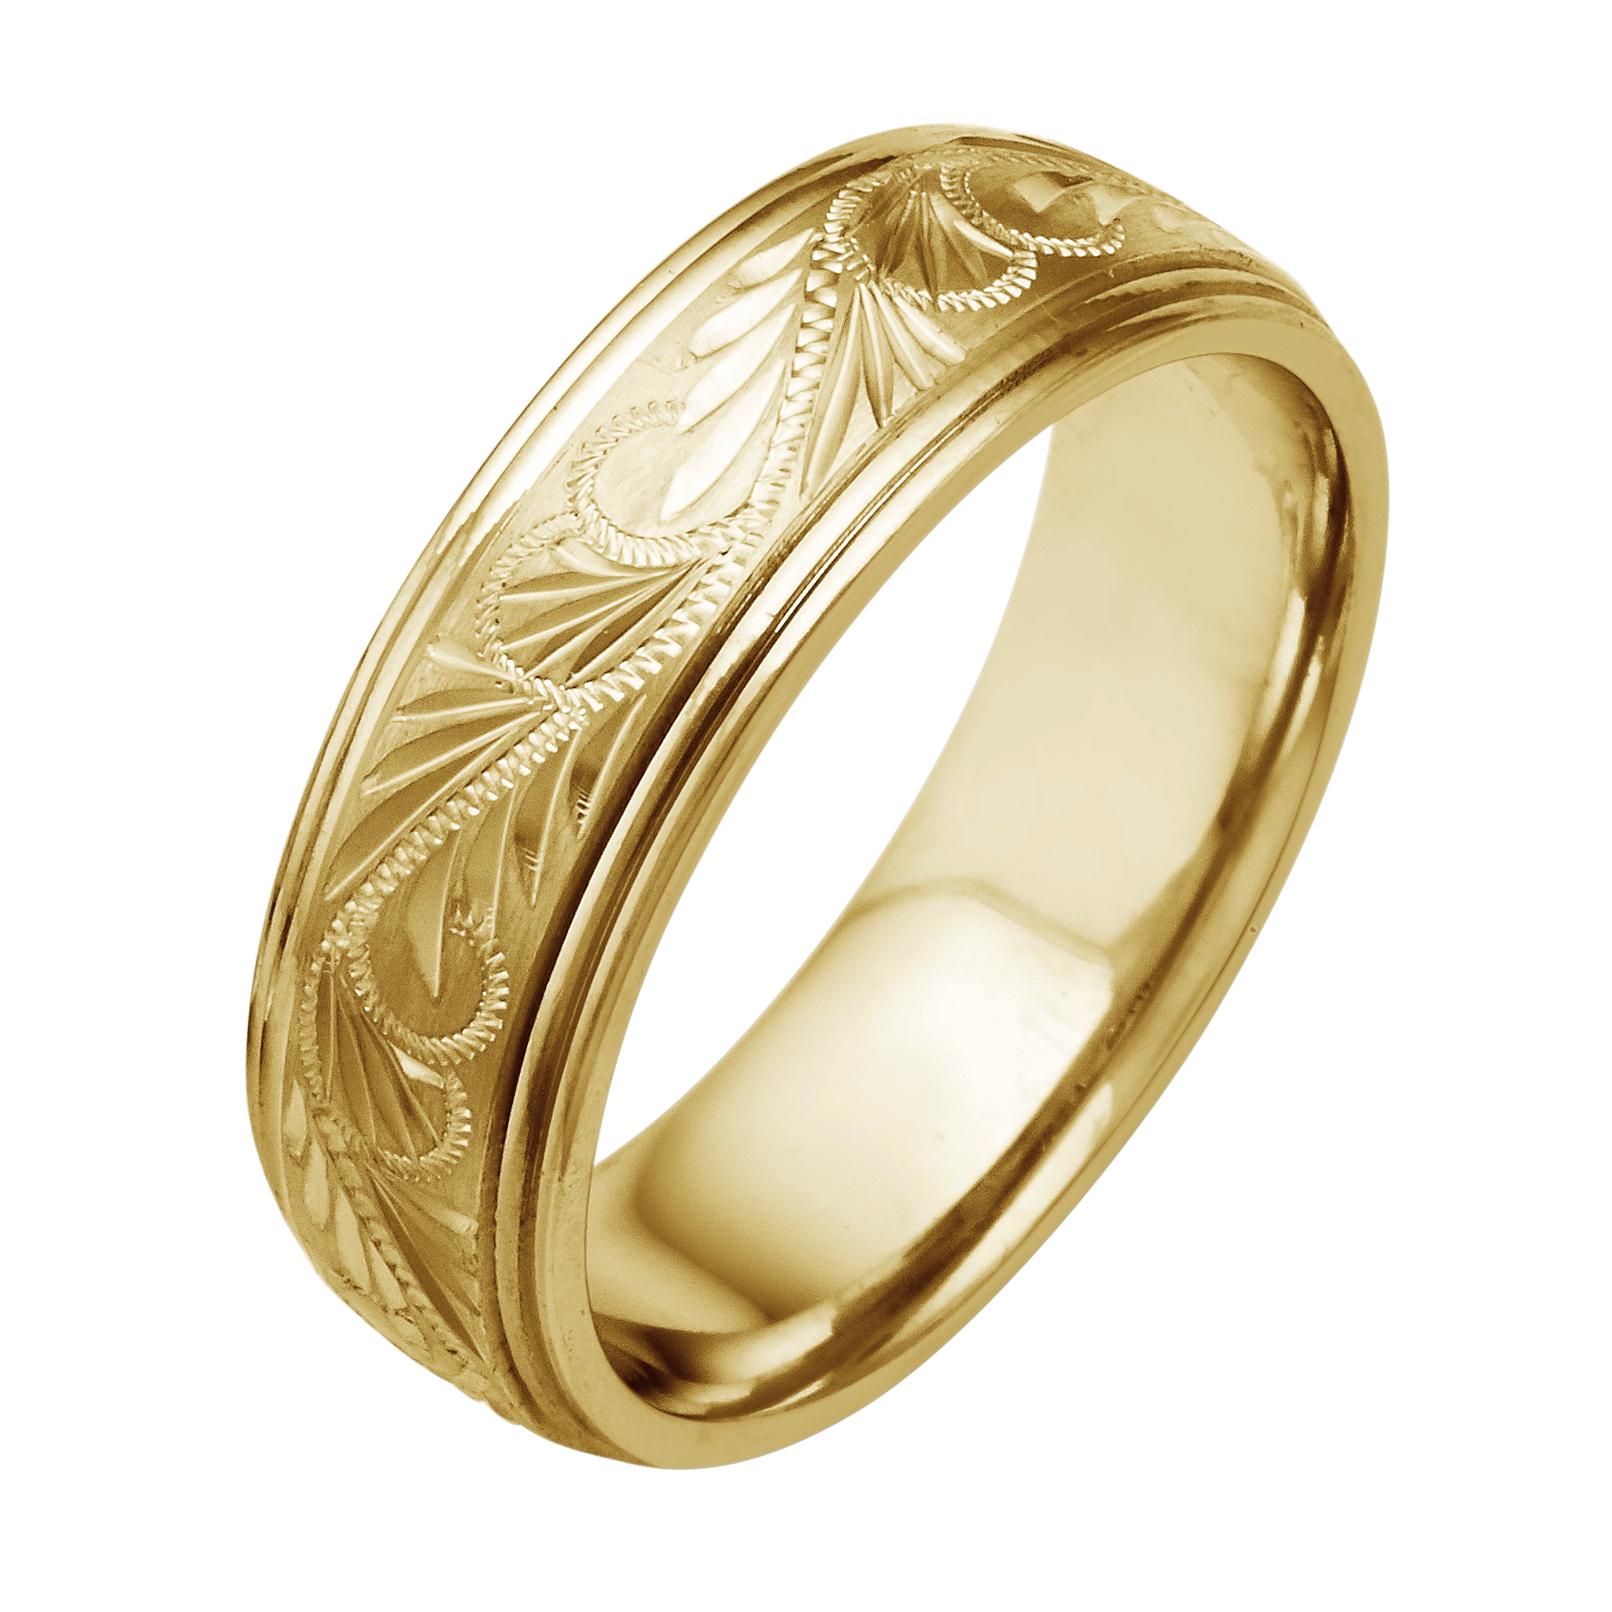 14K18K White Or Yellow Gold Diamond Cut Etruscan Mens Wedding Band